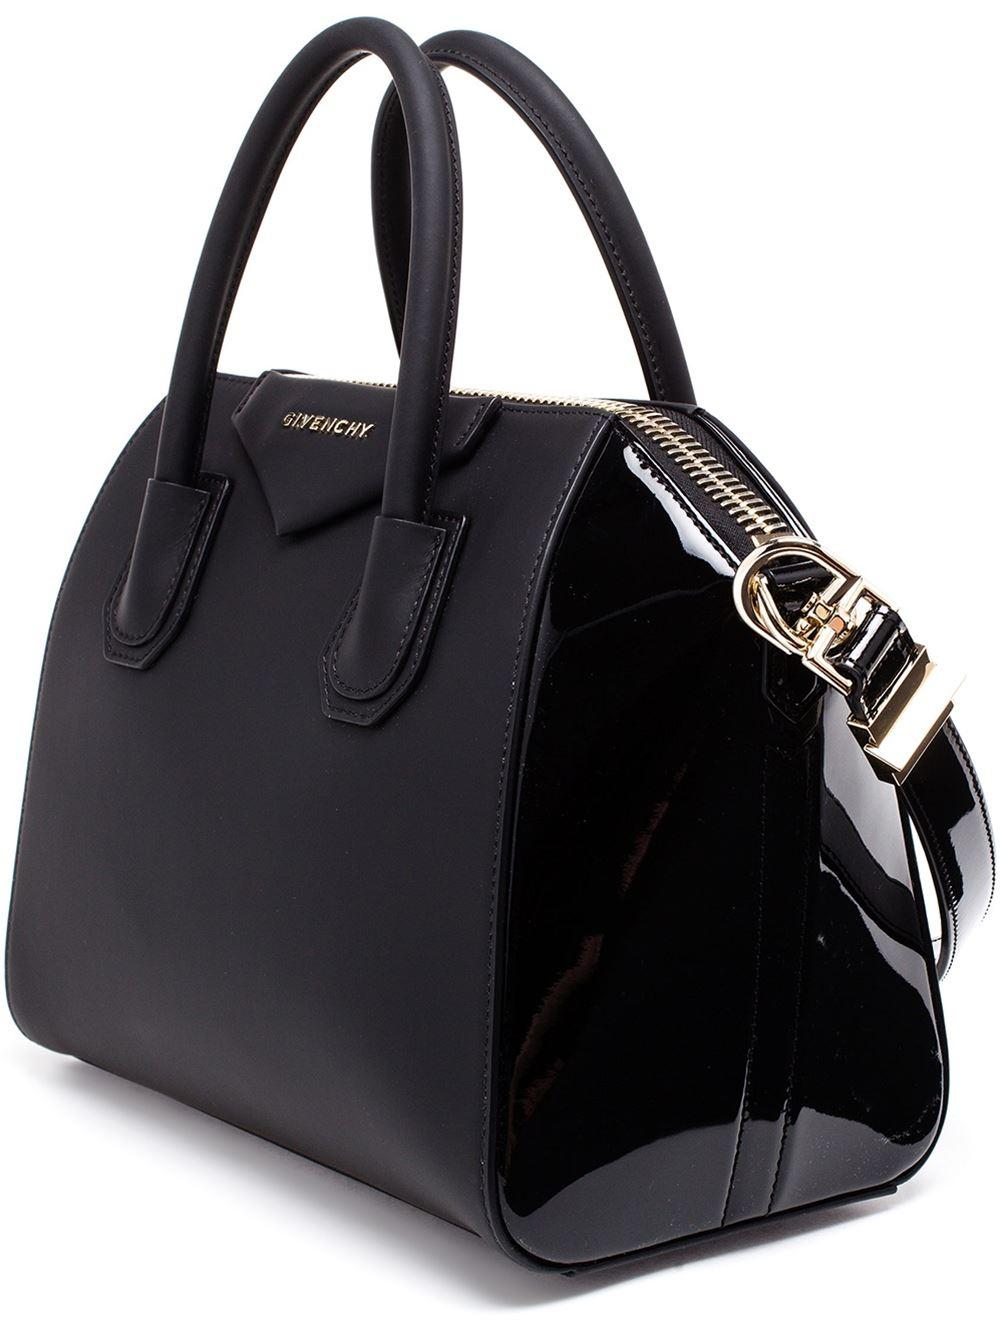 cd5986d6e4 Lyst - Givenchy Medium  Antigona  Tote in Black